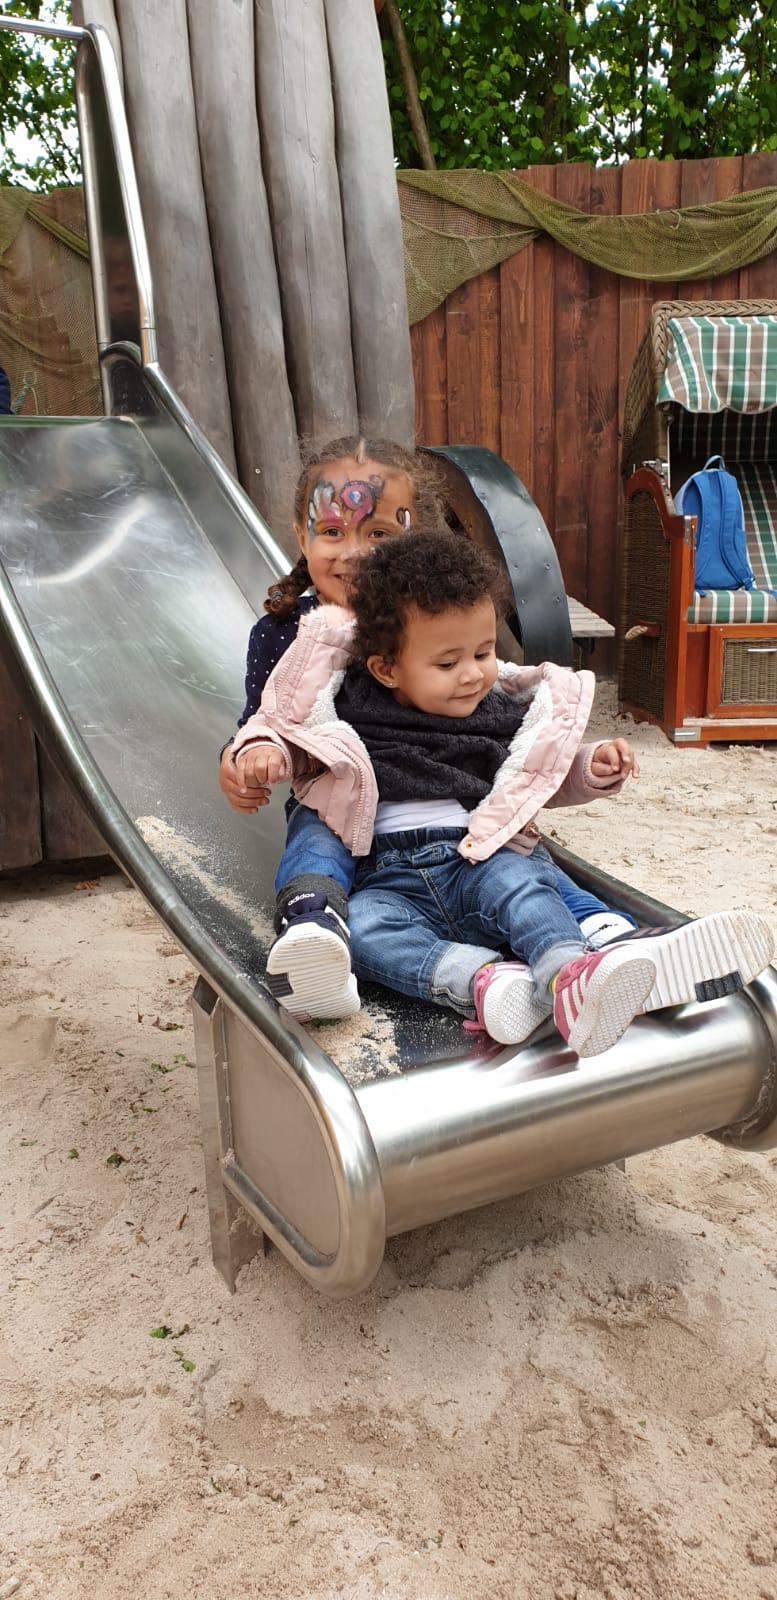 moeders.nu moedertje_lief Europa-park pretpark Rust Duitsland 21